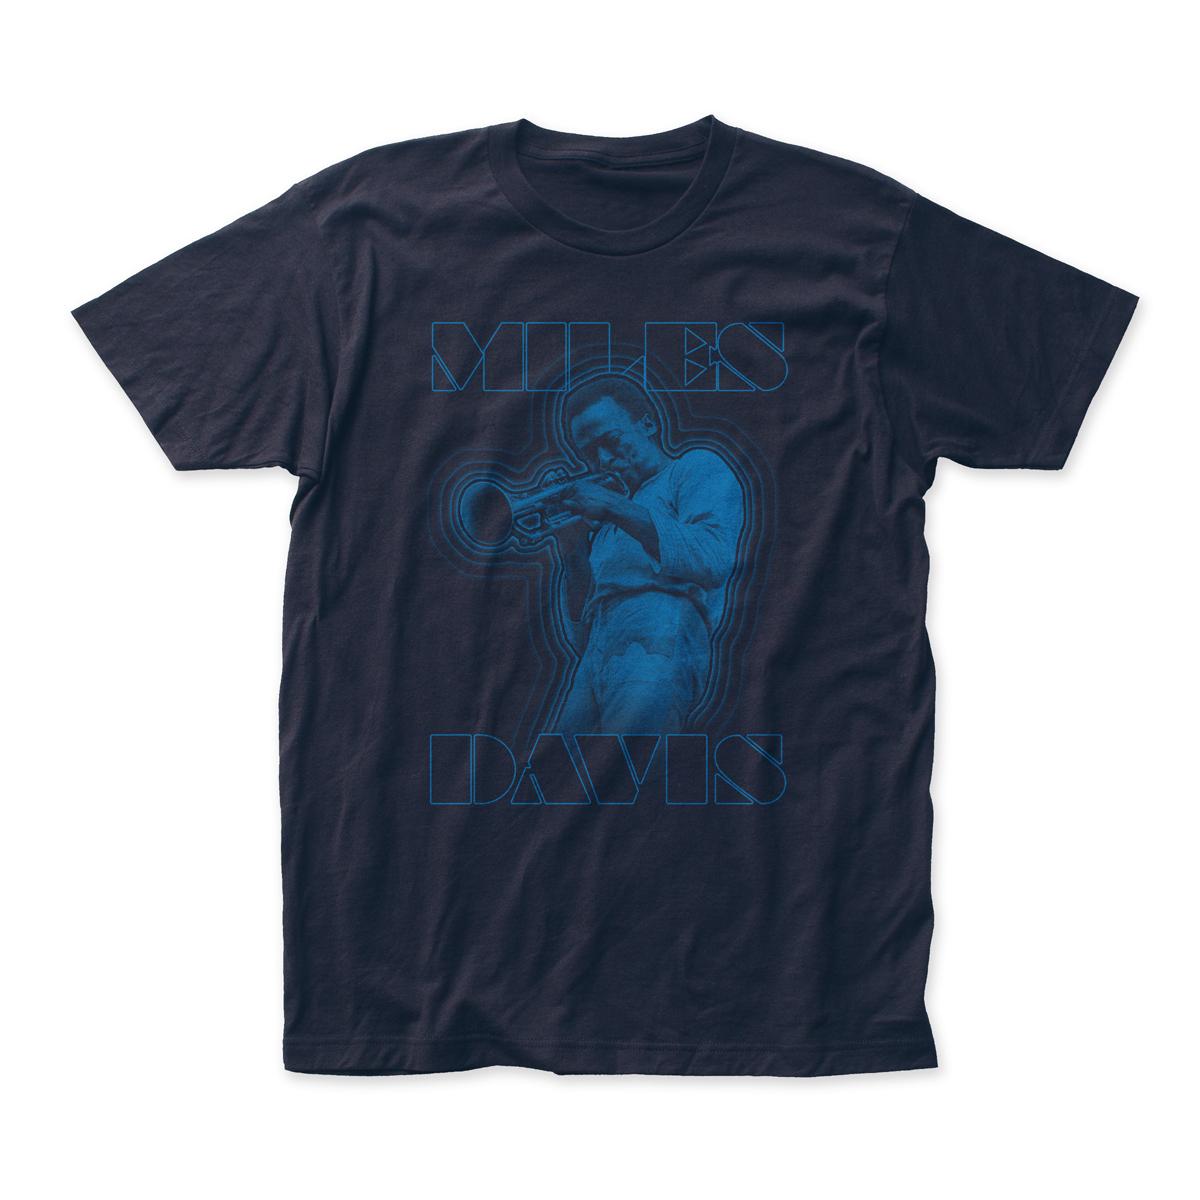 Miles Davis - Waves T-Shirt